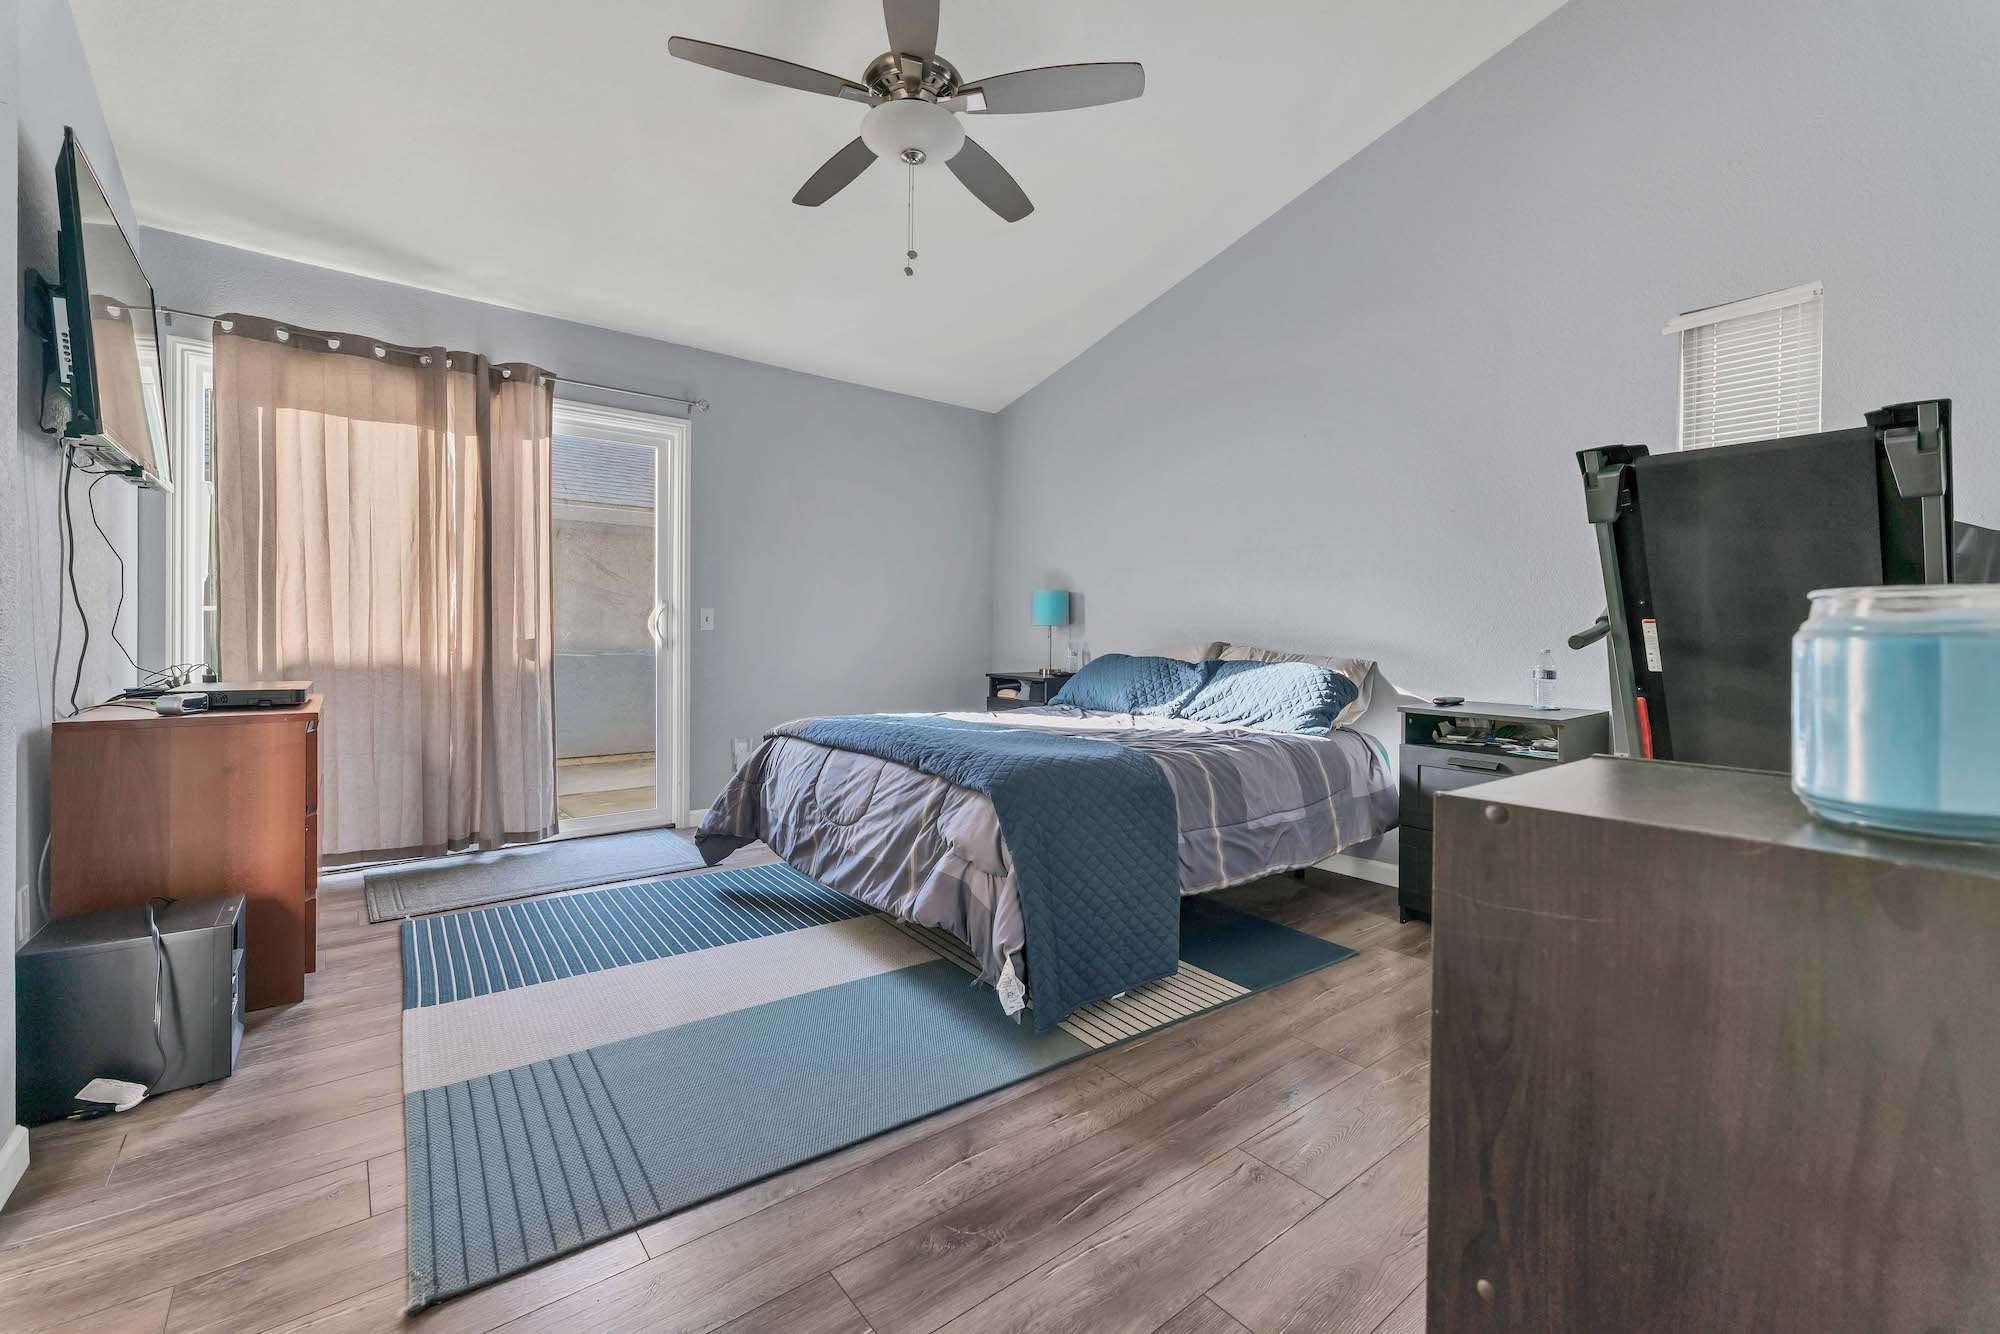 Master bedroom of home at 7121 Heather Tree Dr, Sacramento Ca